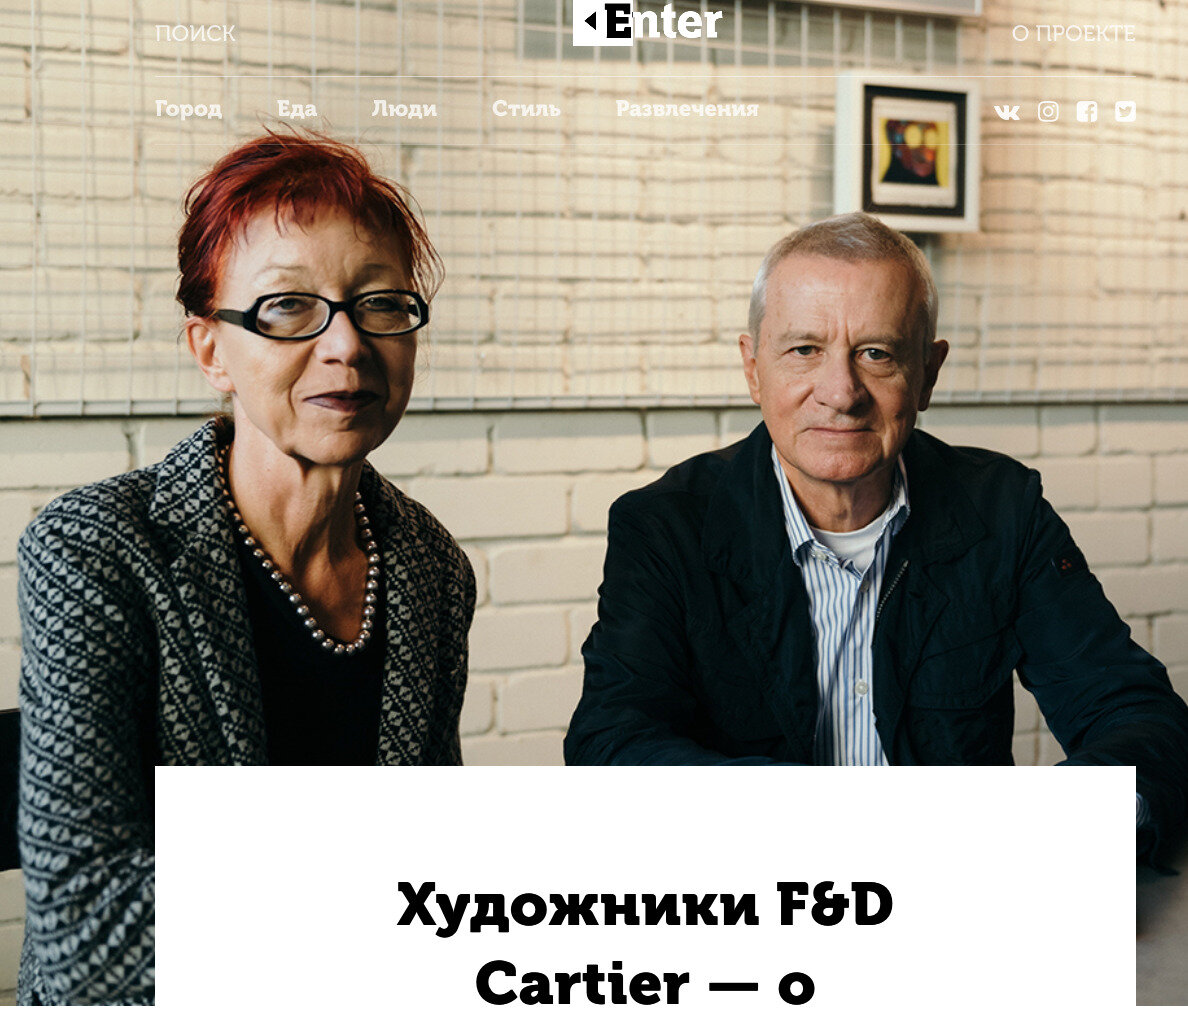 - INTERVIEW in Russian, by Louise Nizamova, online intermedia magazine in Kazan Tatarstan, Russia, 09.2019